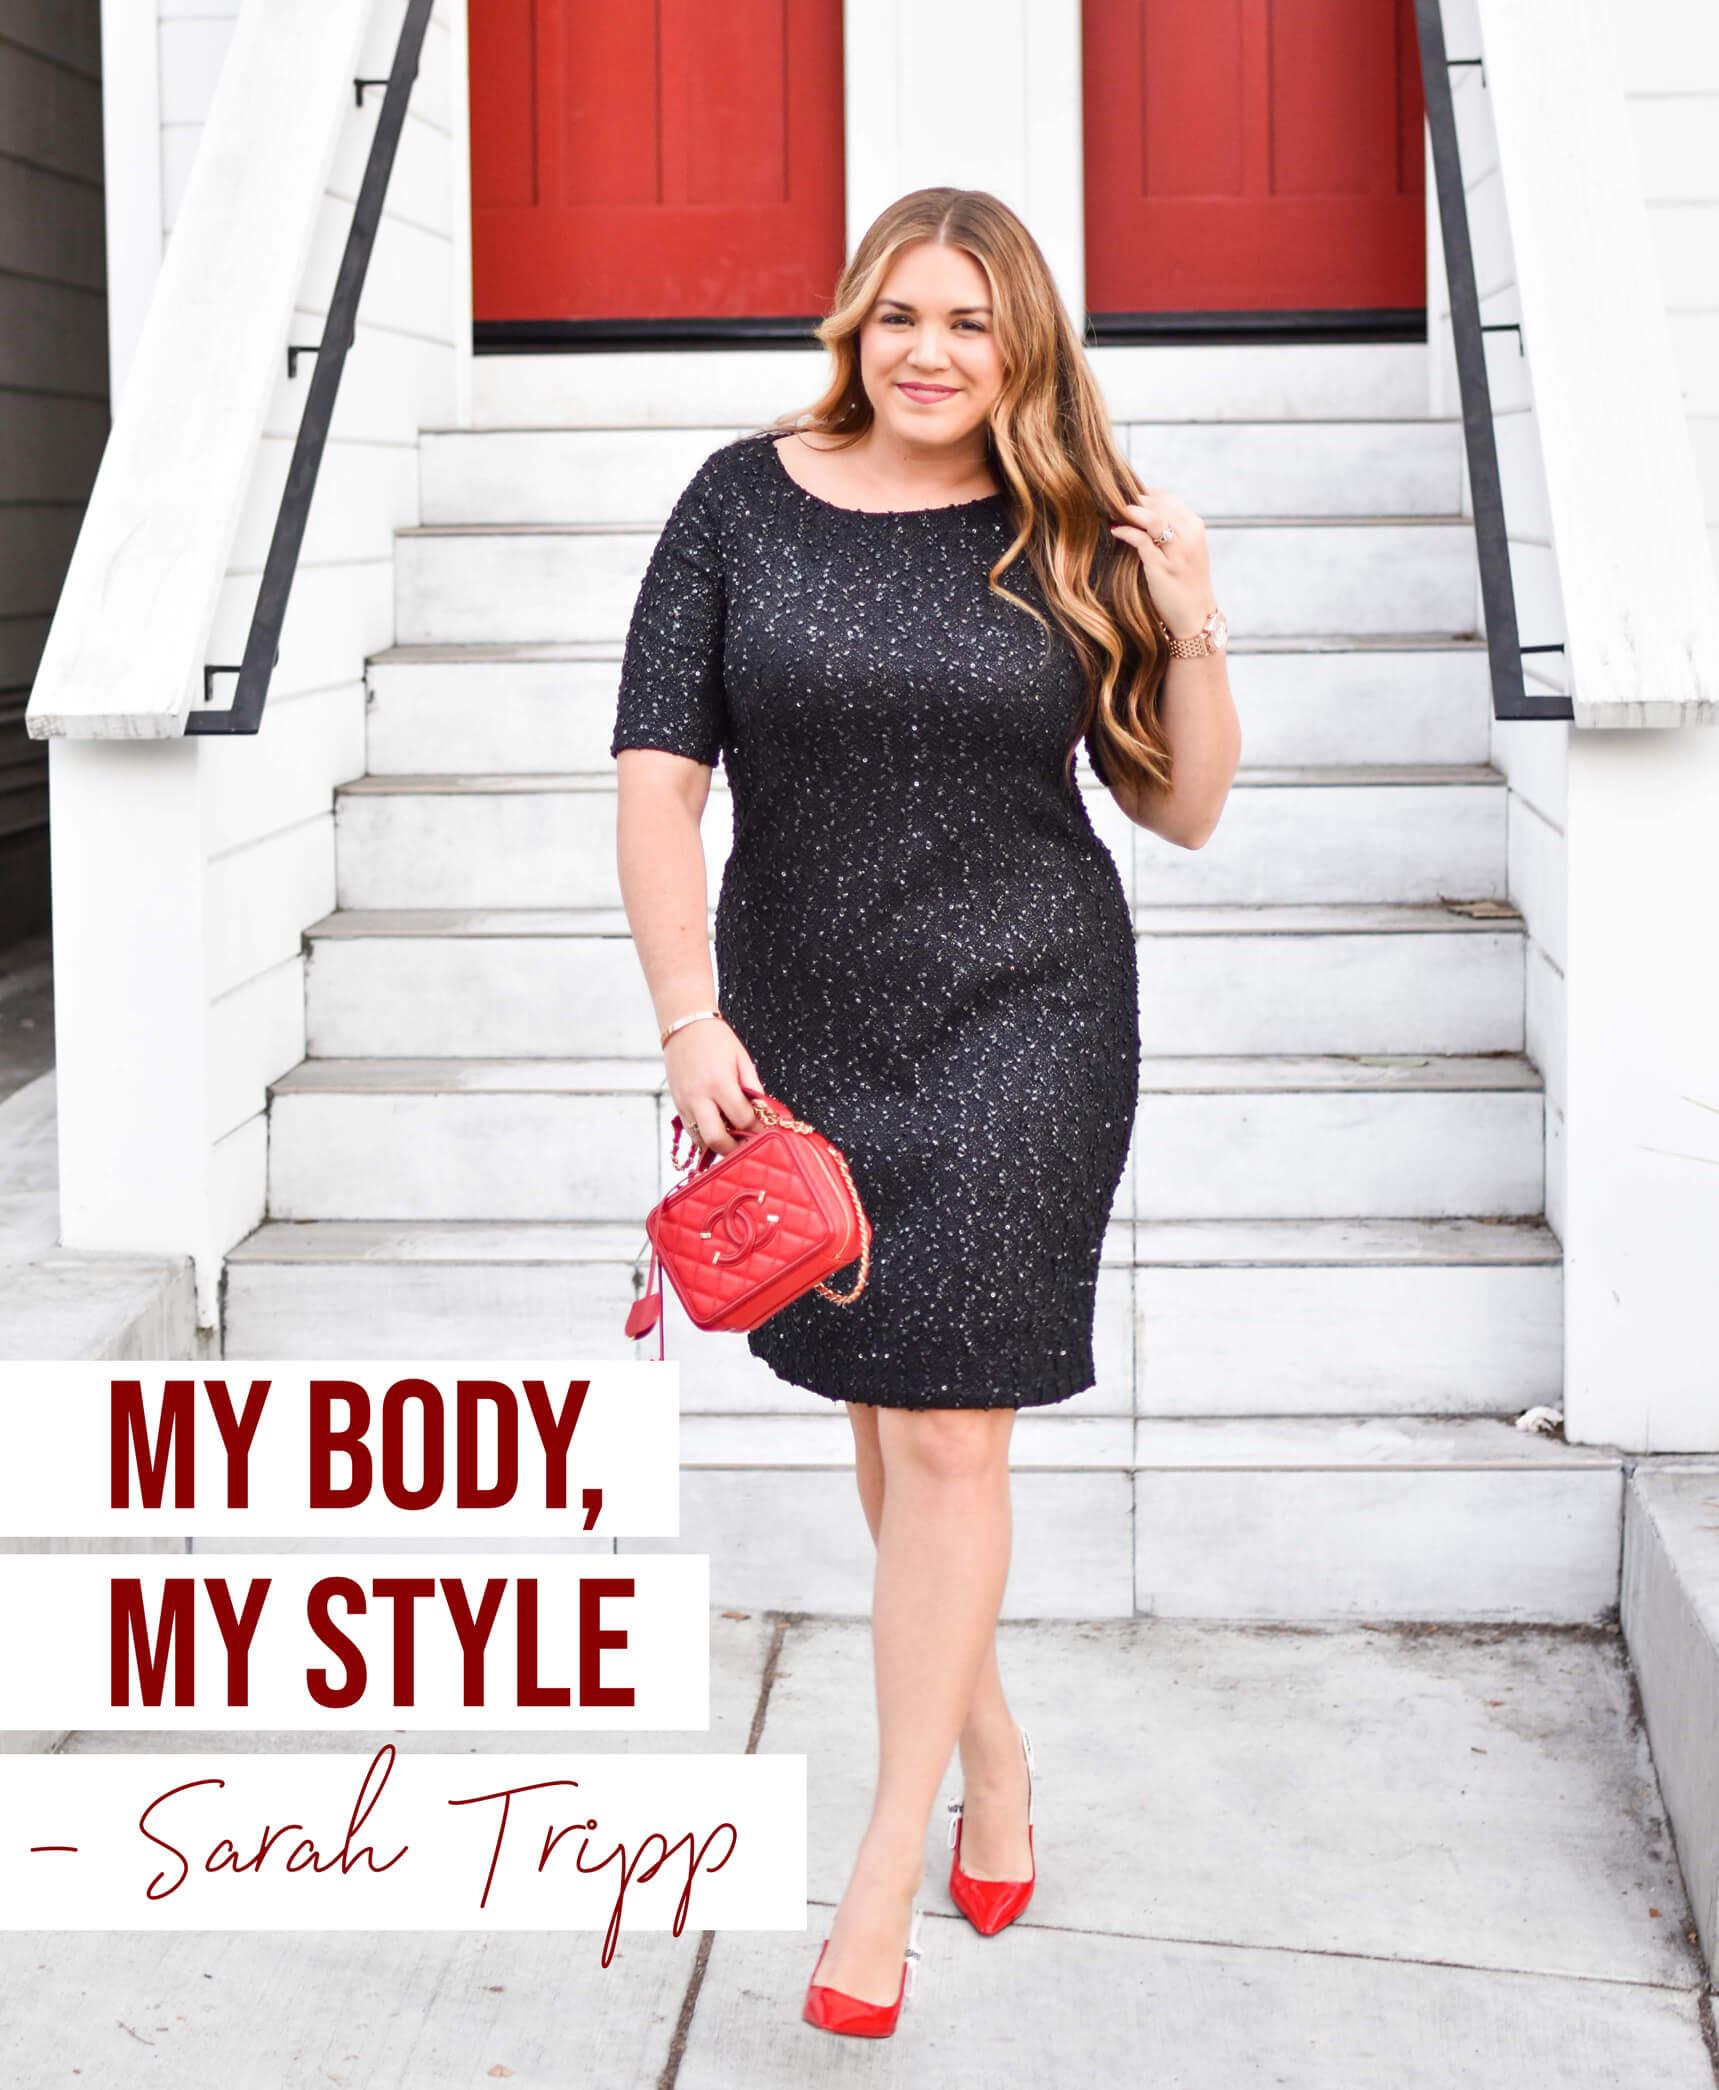 Sarah Tripp: Body Positive Influencer Sarah Tripp Sells Out First Signature Swimsuit Collection